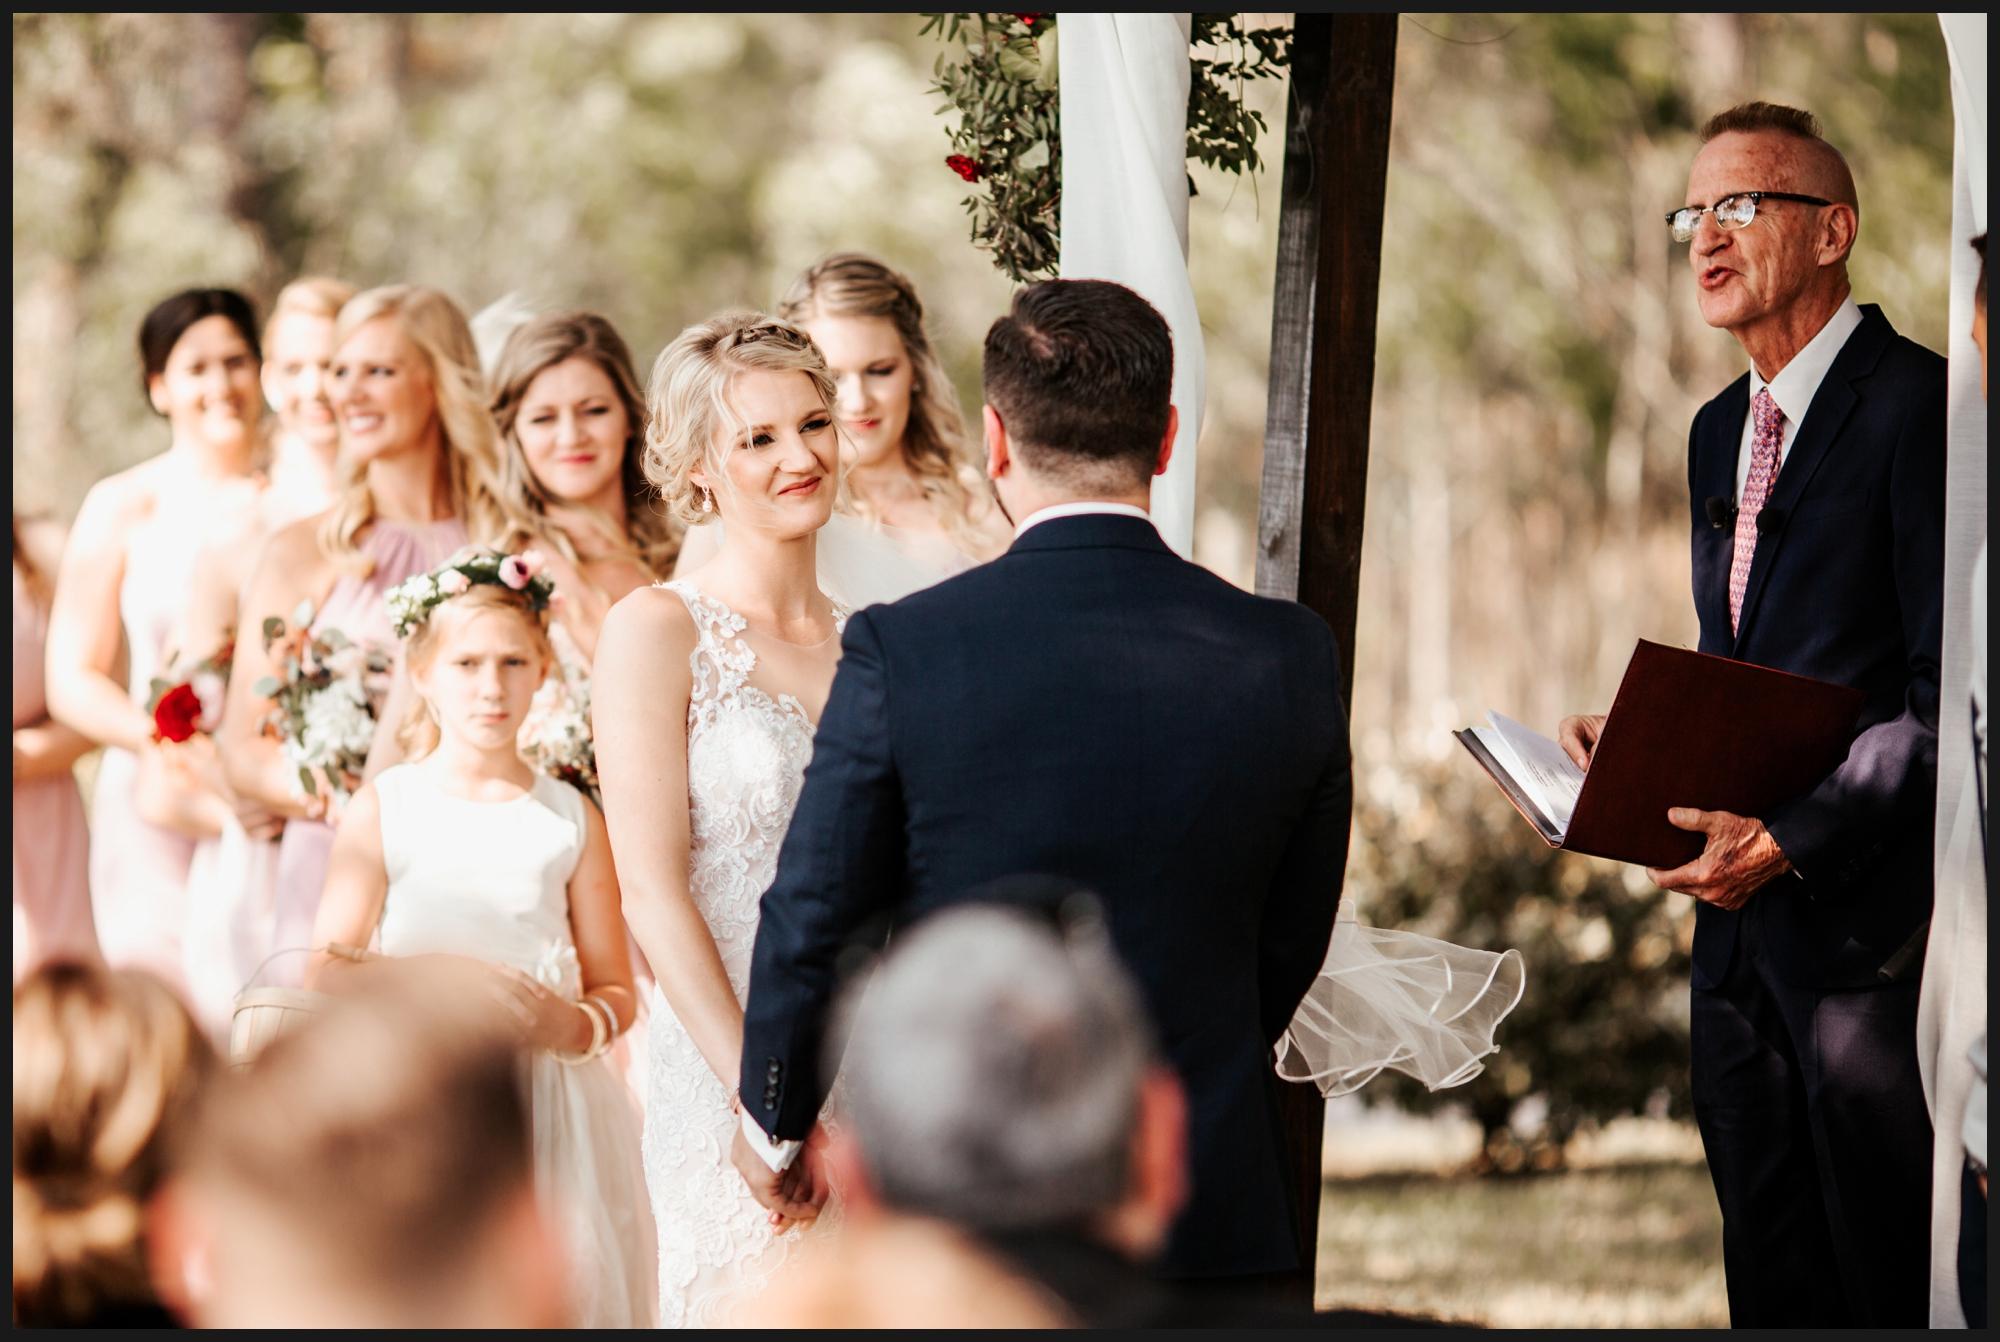 Orlando-Wedding-Photographer-destination-wedding-photographer-florida-wedding-photographer-hawaii-wedding-photographer_0595.jpg